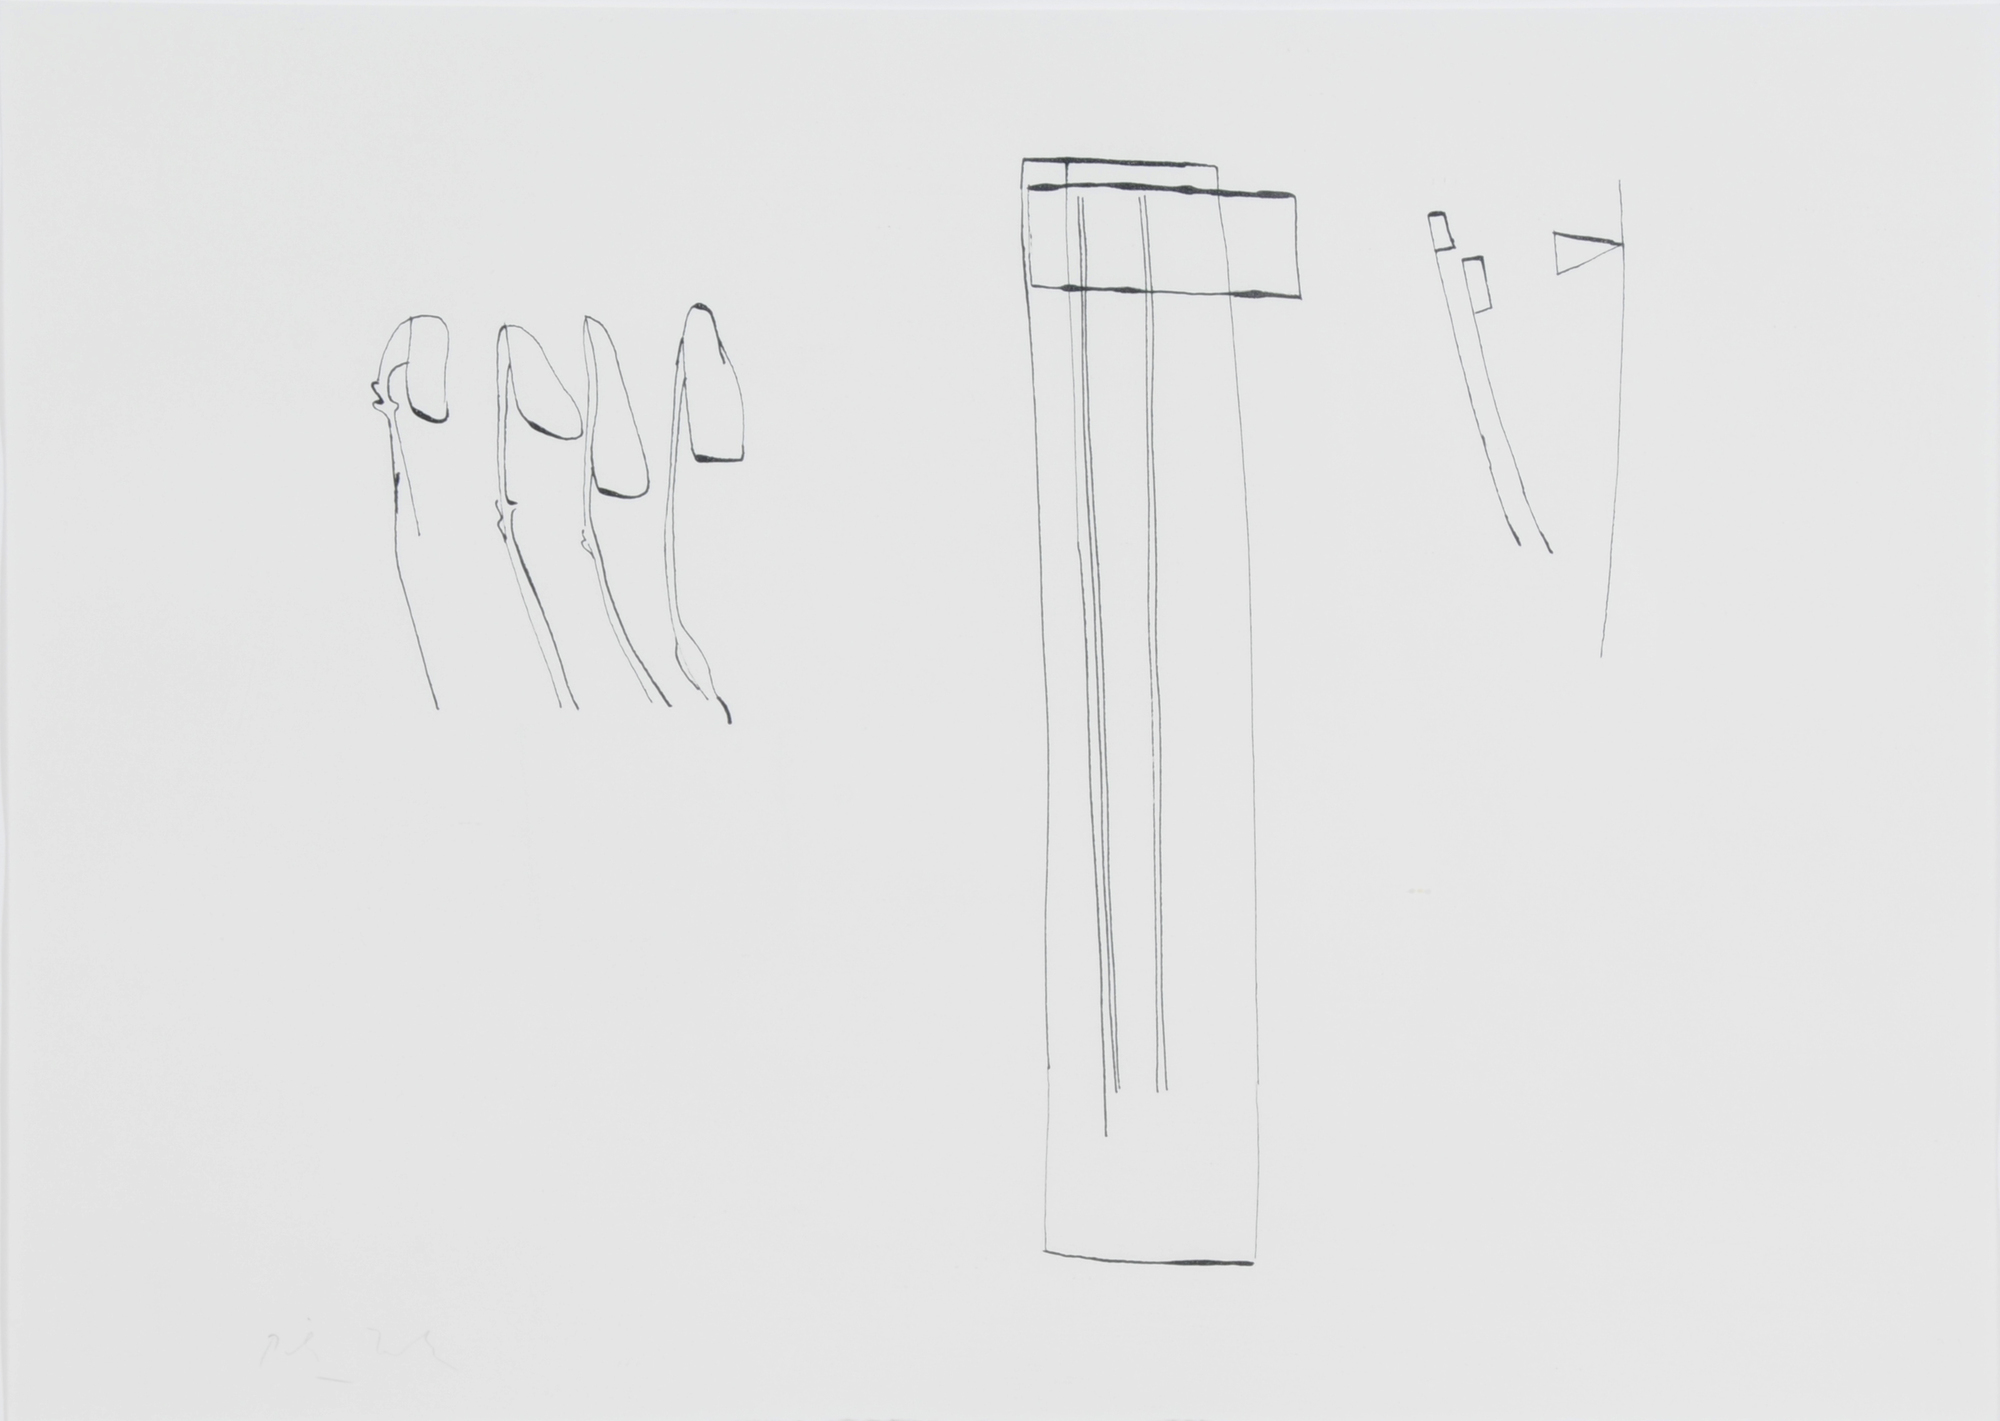 Pils Tobias Raphael, Untitled